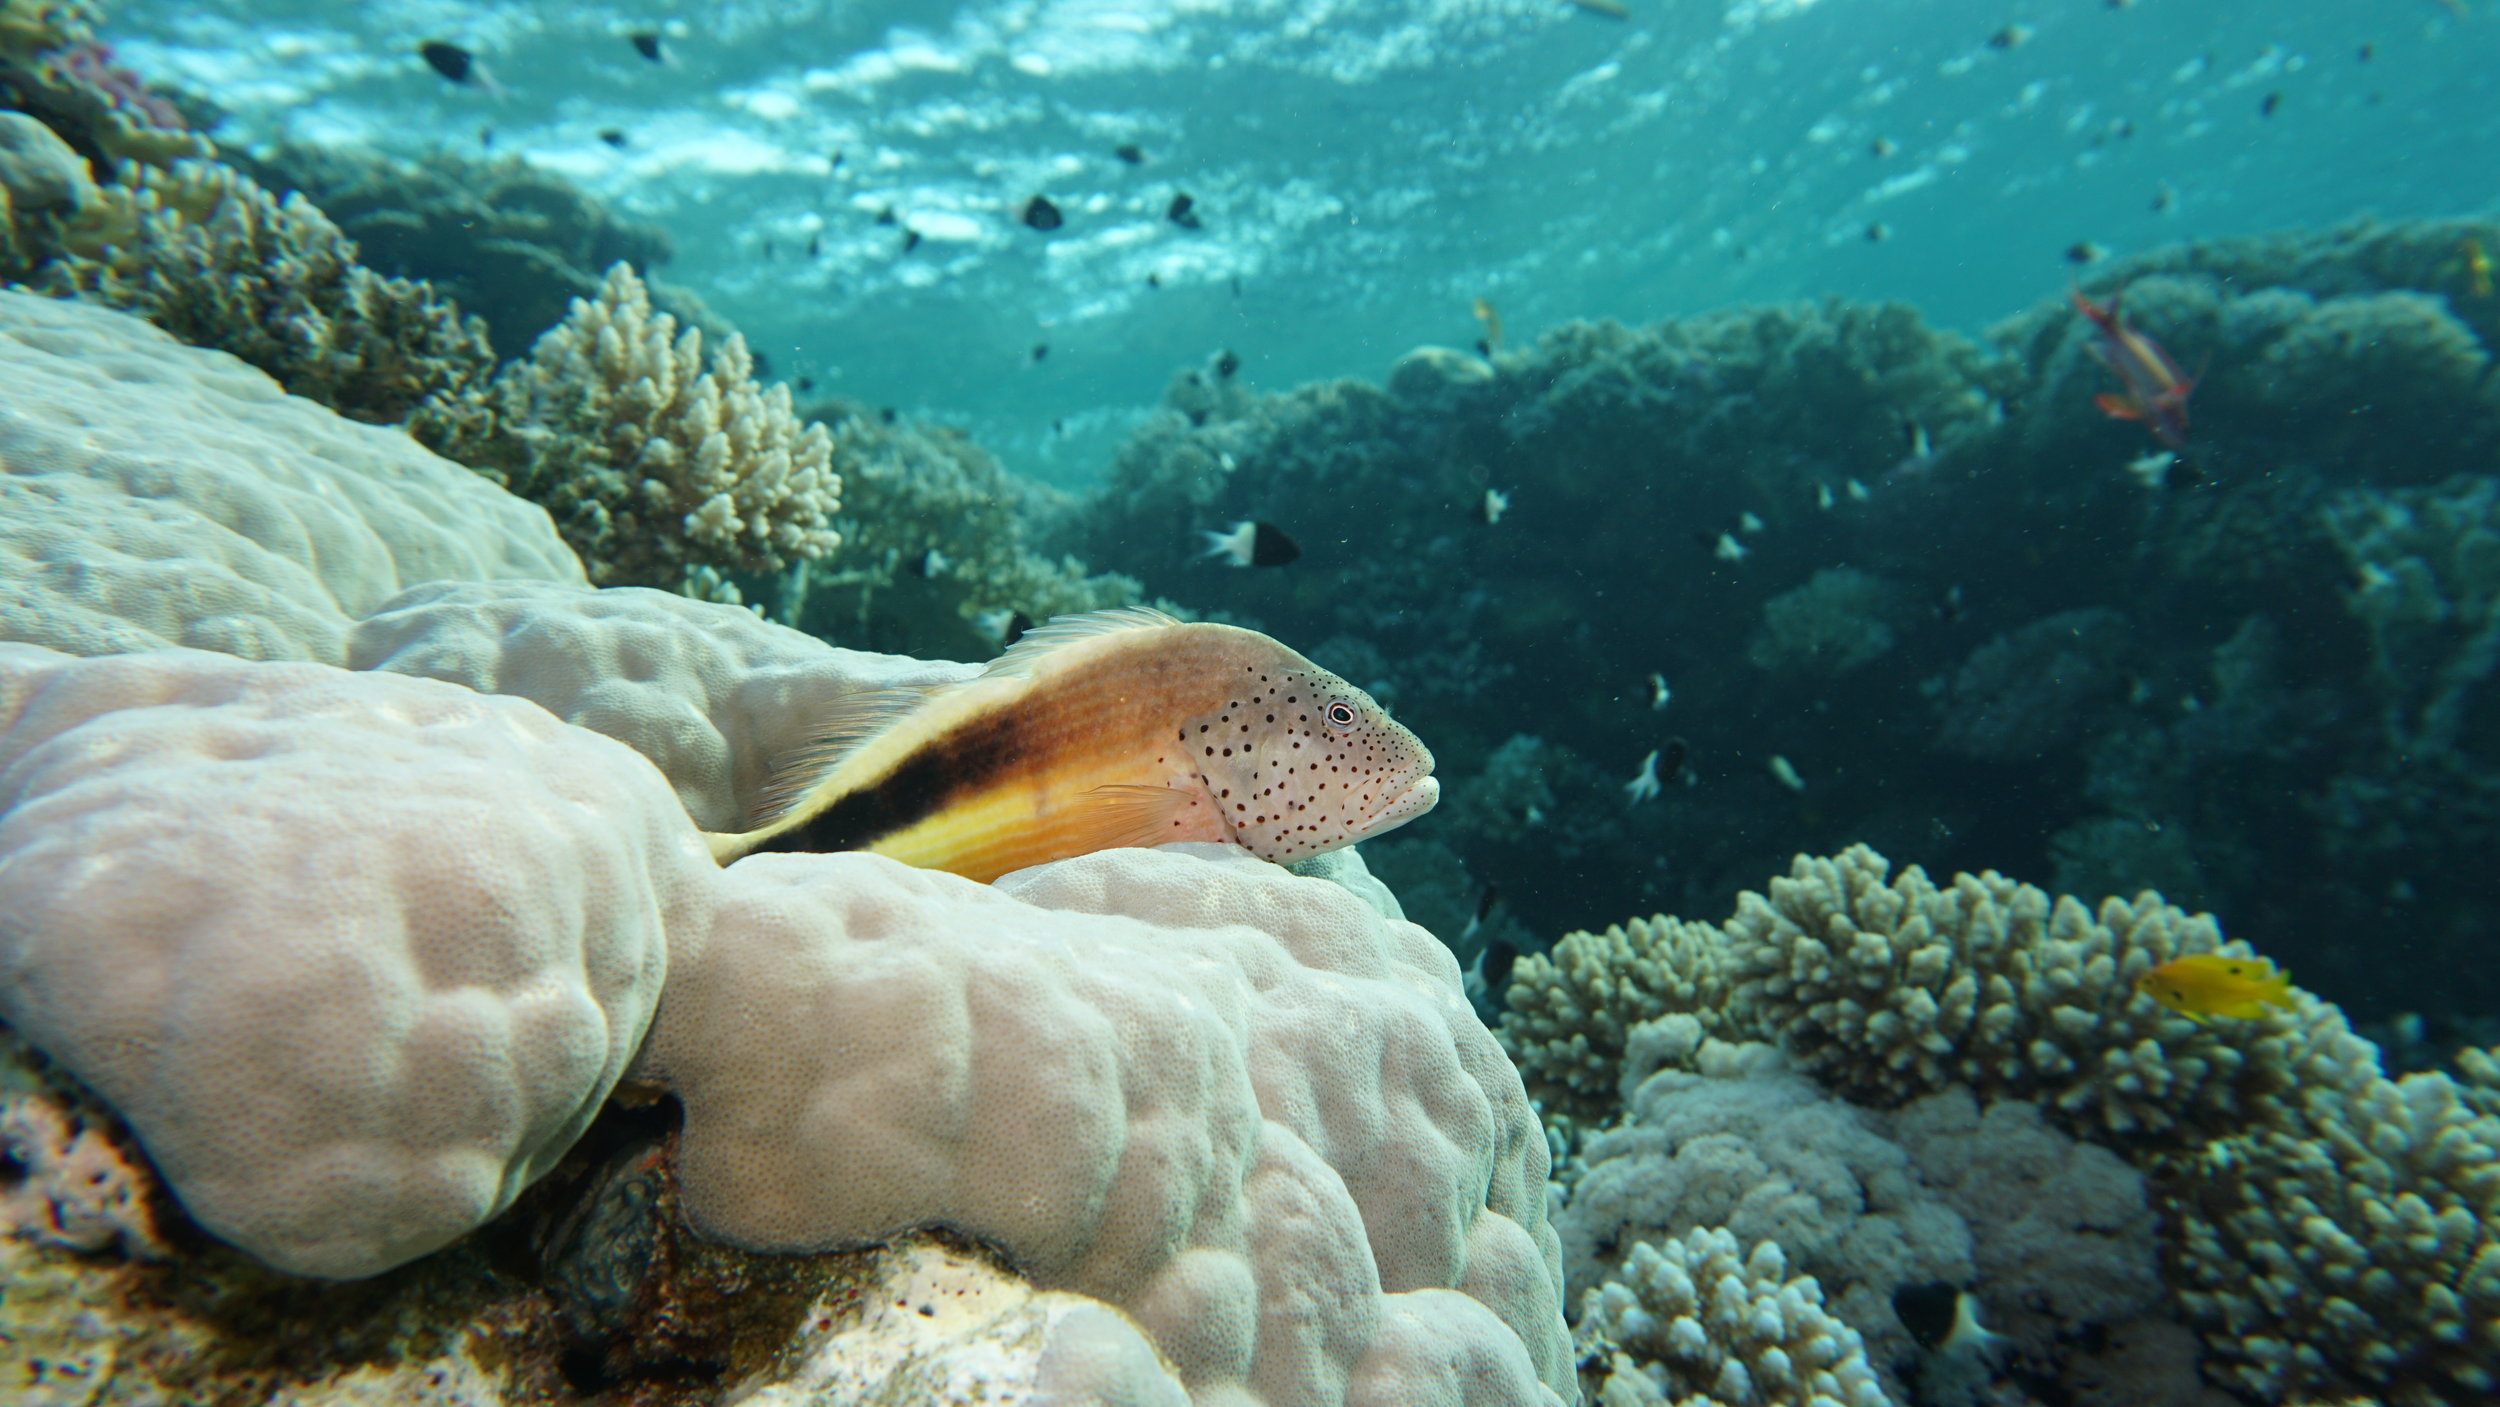 Freckled hawkfish credit: Ceyhan Bekiroglu / coral reef image bank